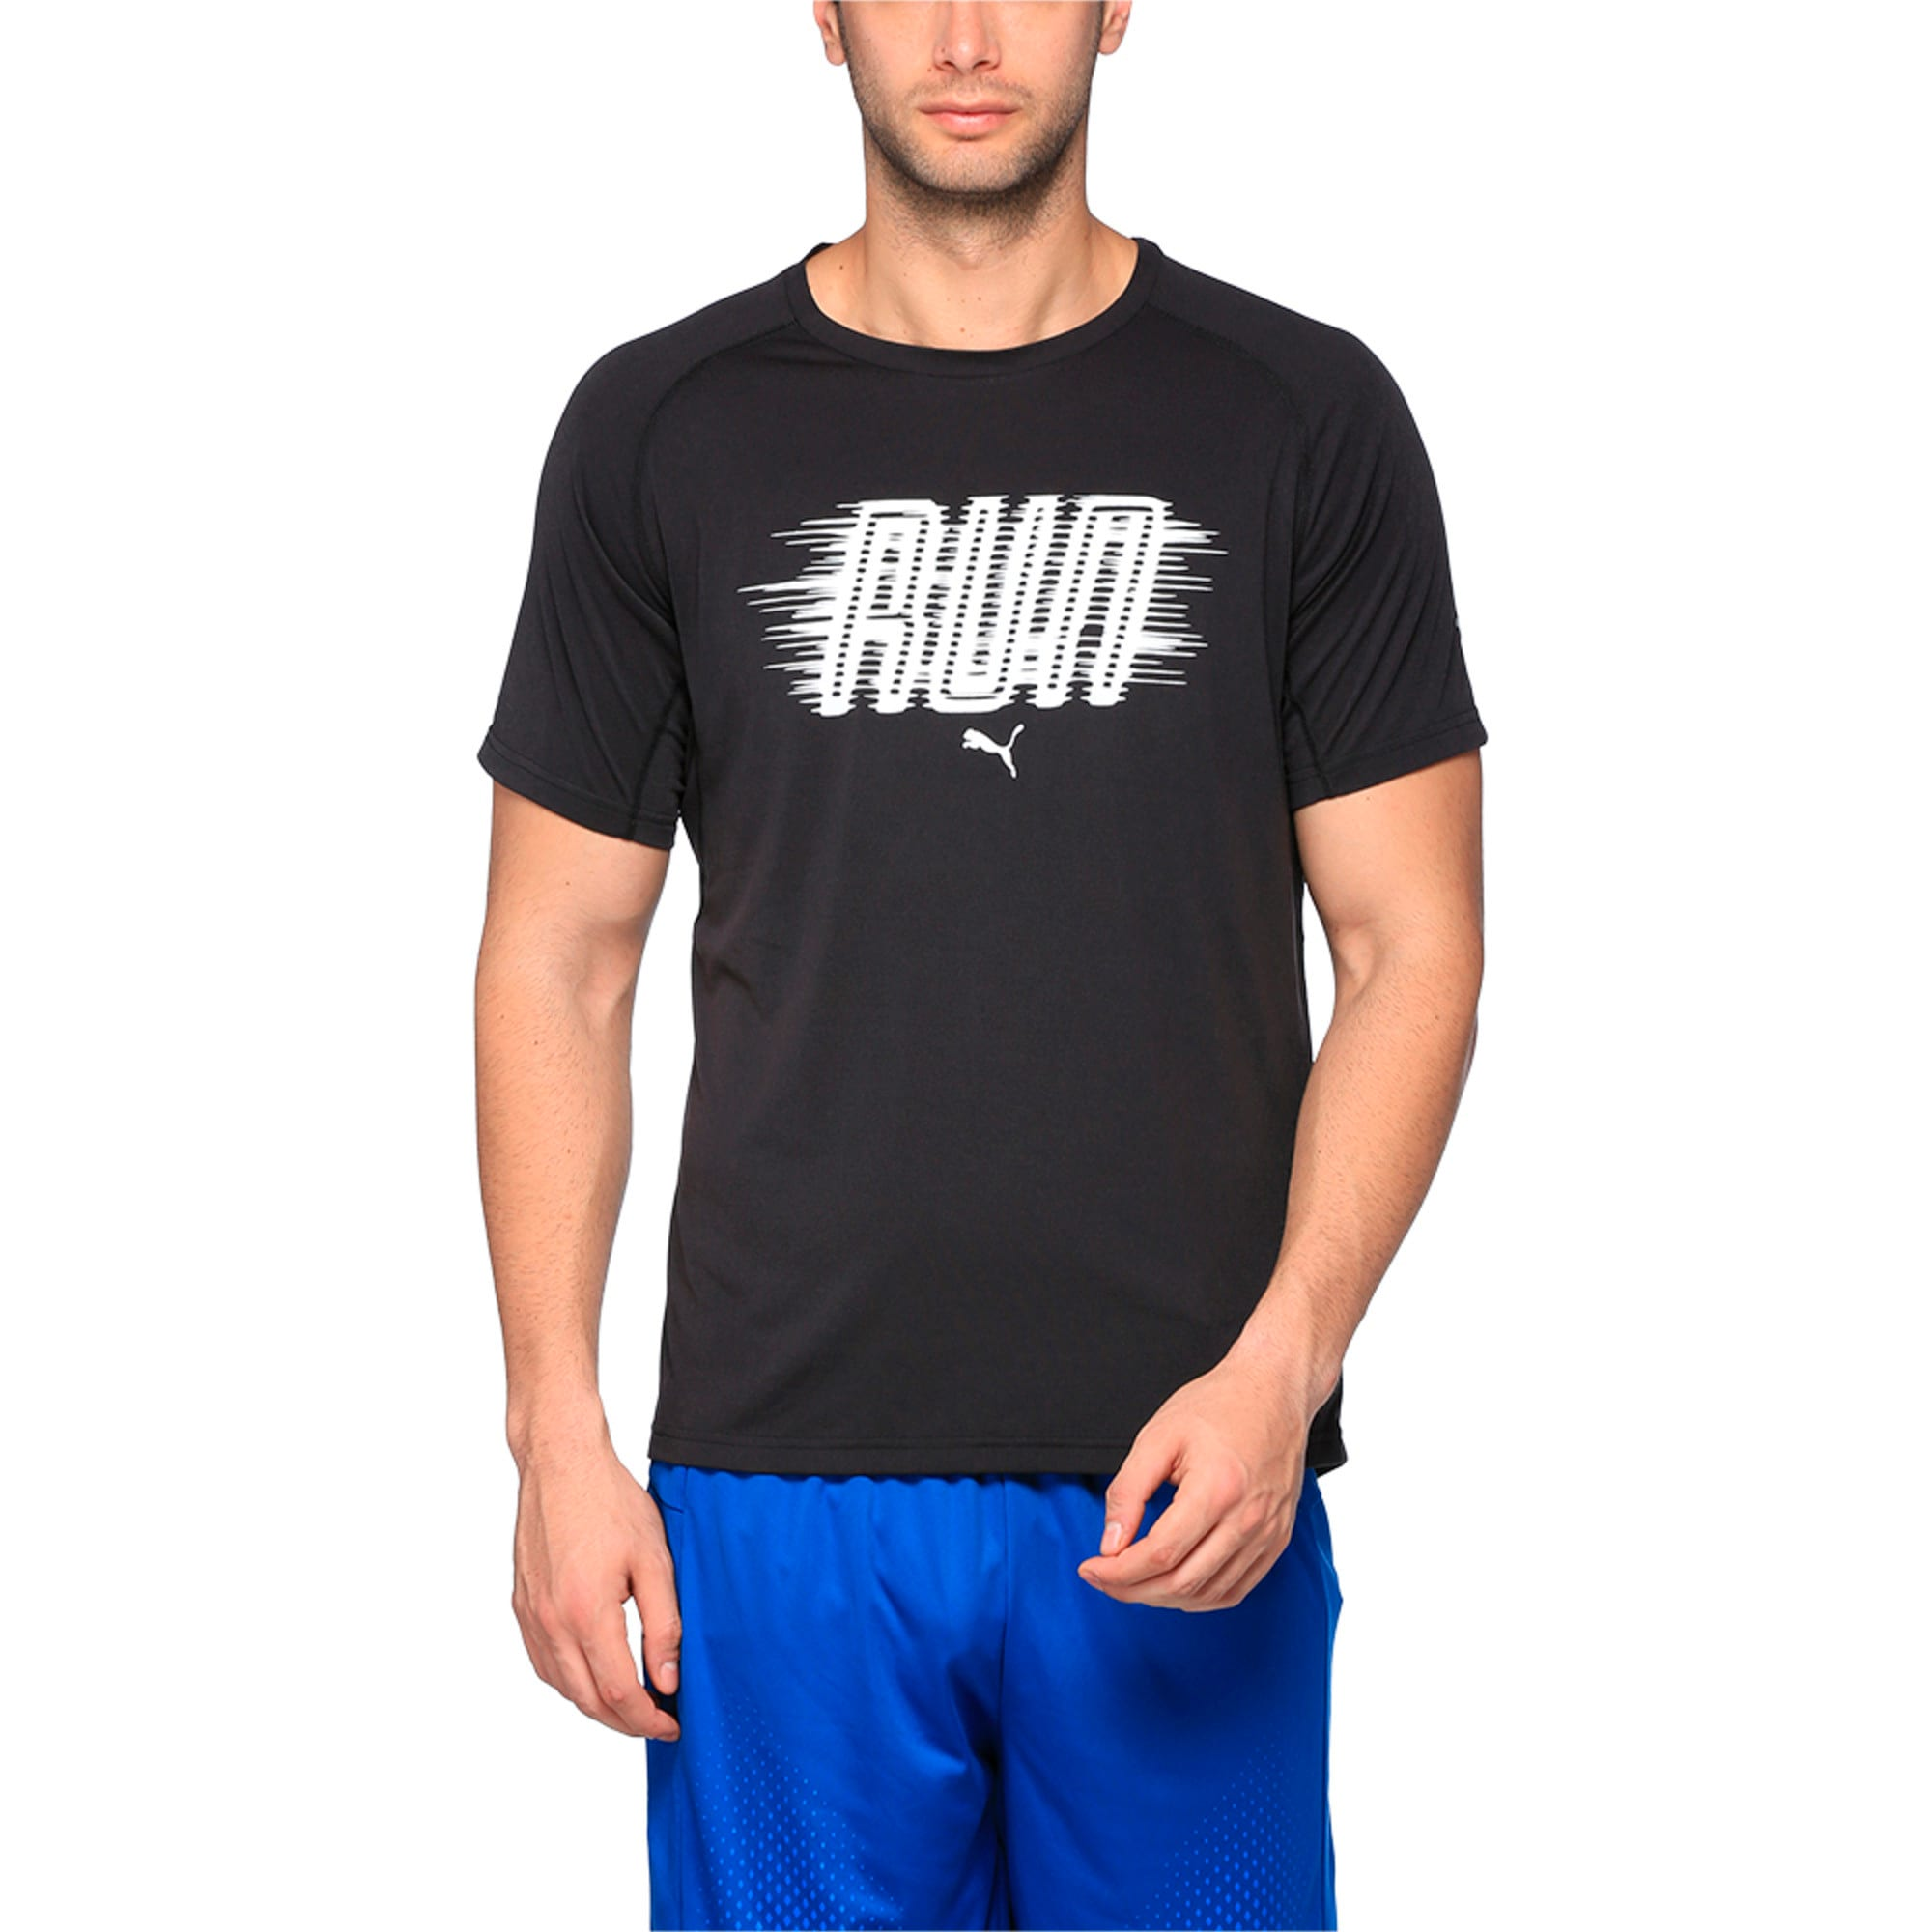 Thumbnail 1 of Running Men's Run T-Shirt, Puma Black Heather, medium-IND